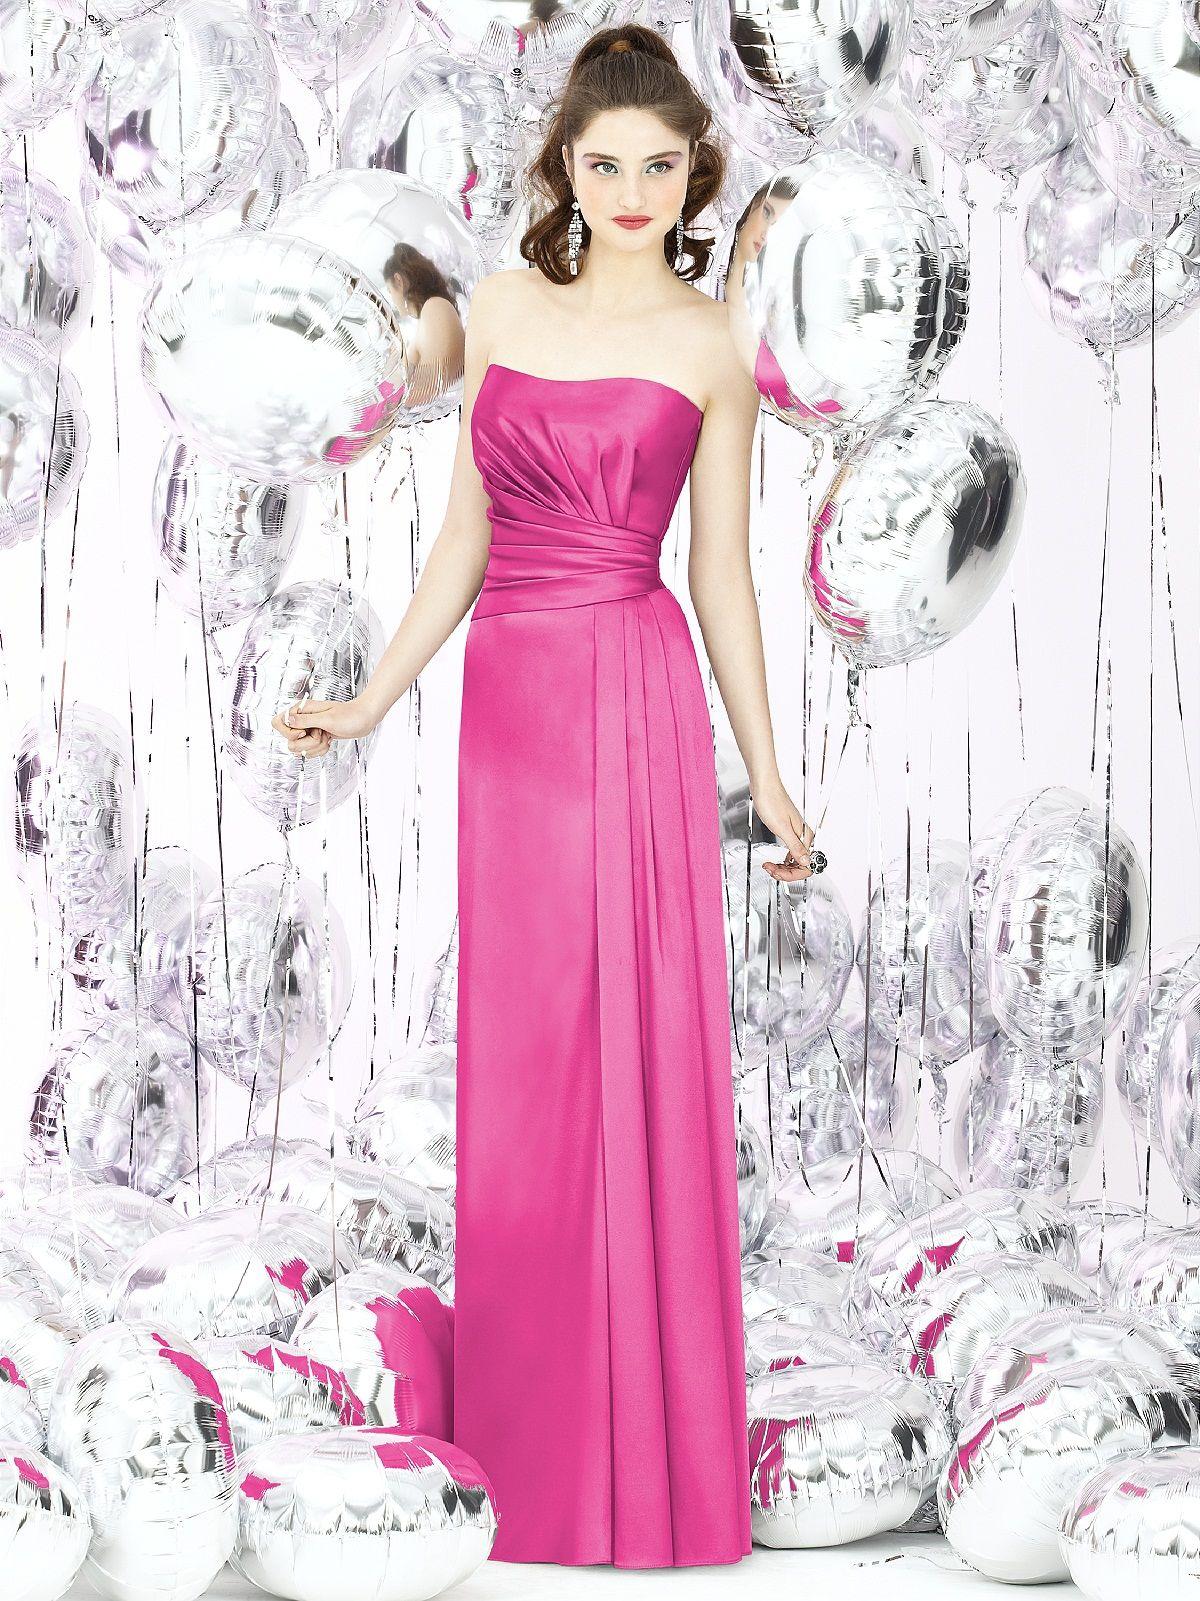 Bonito Vestido De Fiesta Amor Púrpura Ideas Ornamento Elaboración ...